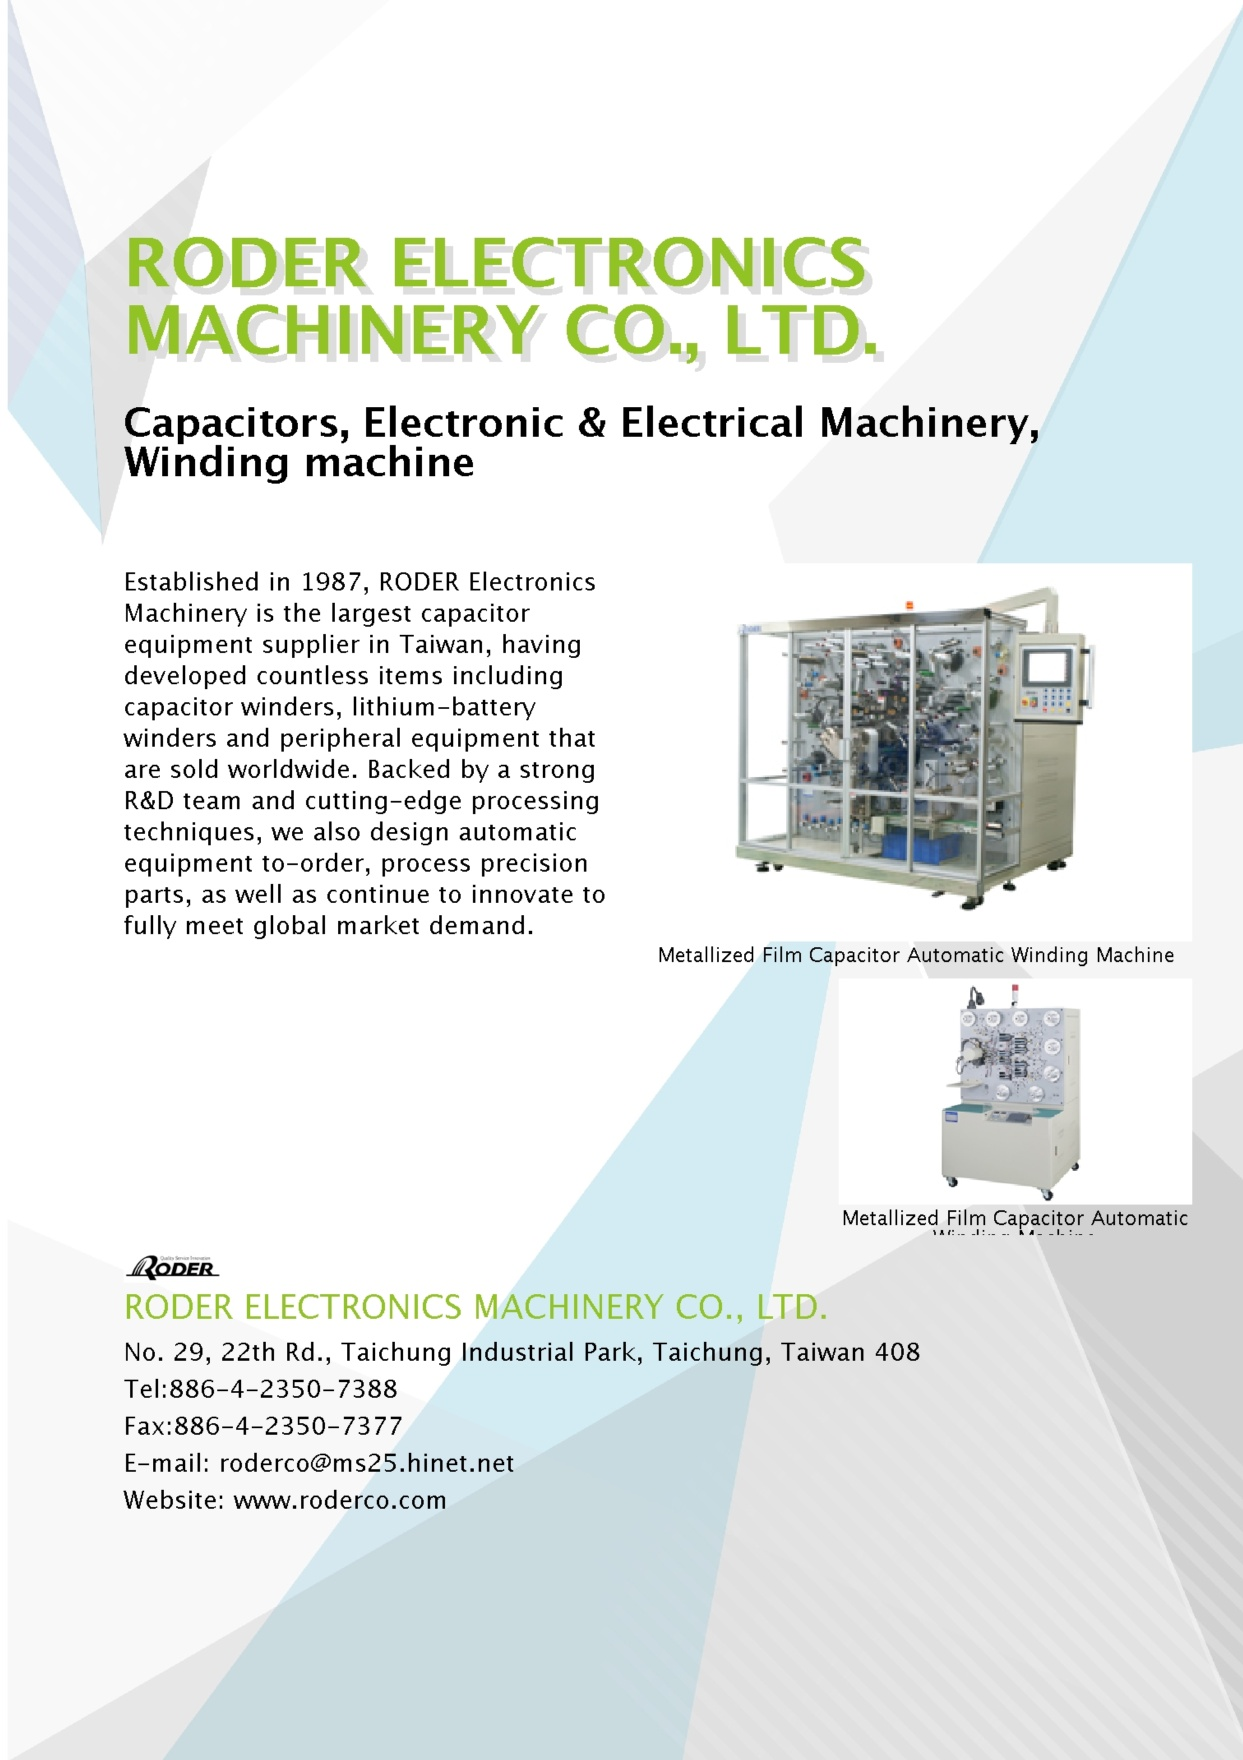 RODER ELECTRONICS MACHINERY CO., LTD.